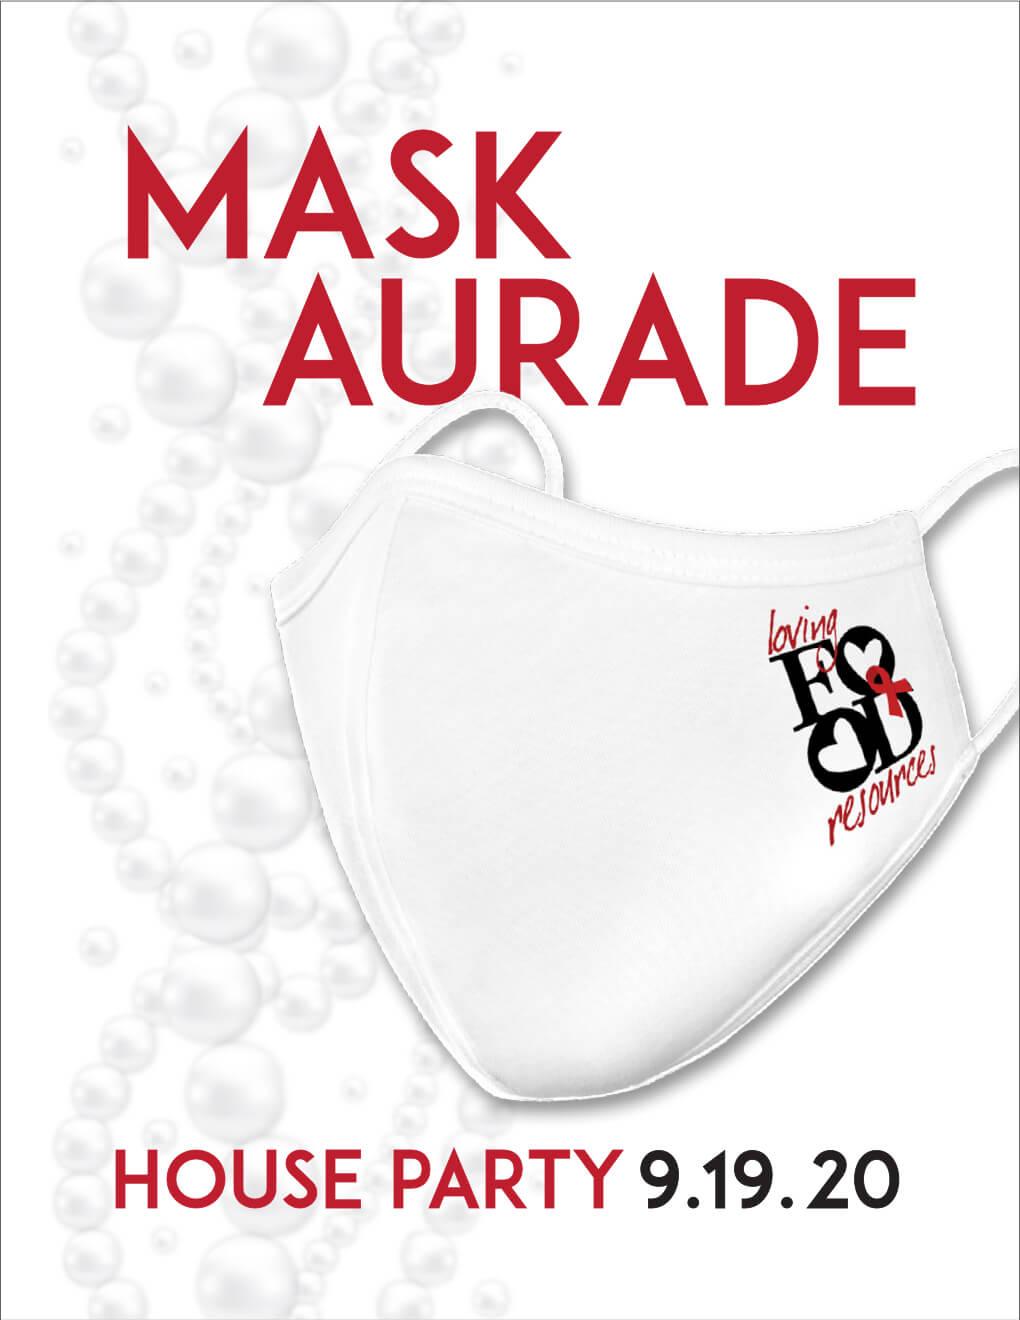 Maskaurade House Party